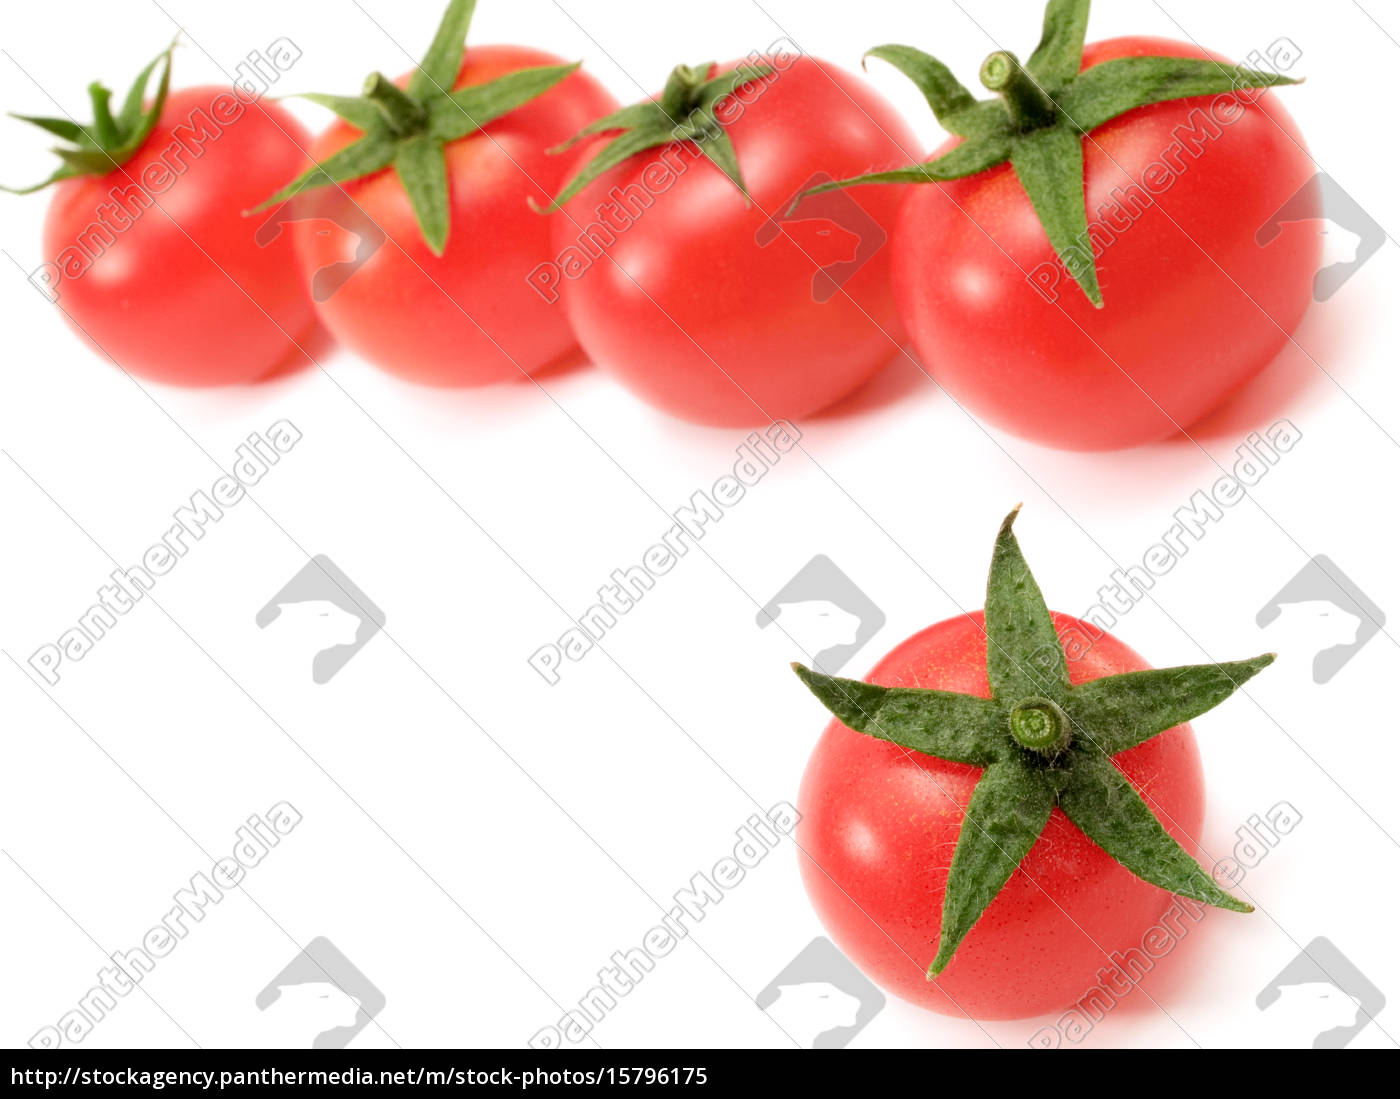 cherry, tomatoes, cherry, tomatoes, cherry, tomatoes, cherry, tomatoes, cherry, tomatoes, cherry - 15796175